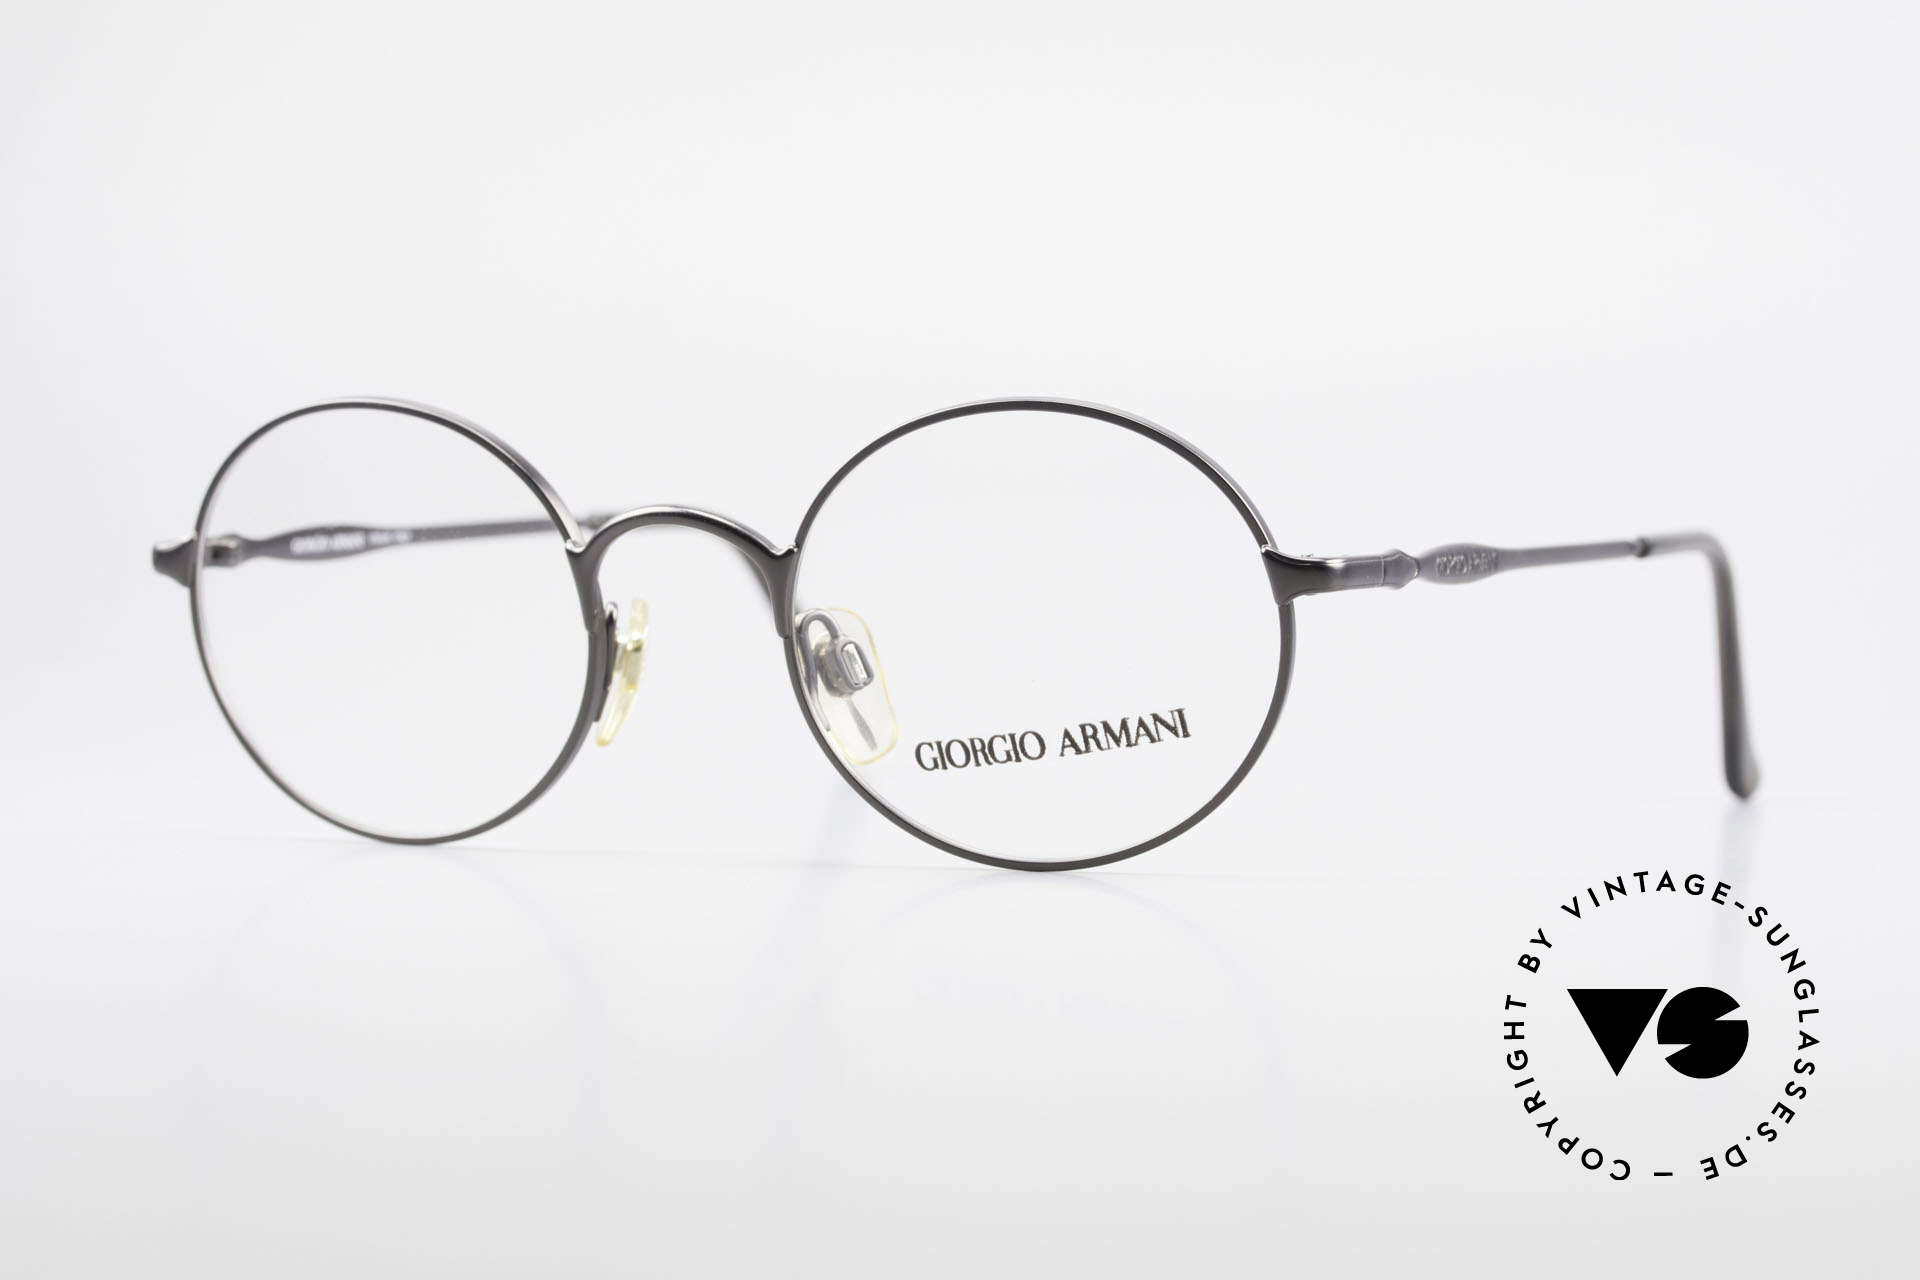 Giorgio Armani 243 Small Round Oval Glasses 90s, vintage designer eyeglasses by GIORGIO Armani, Made for Men and Women